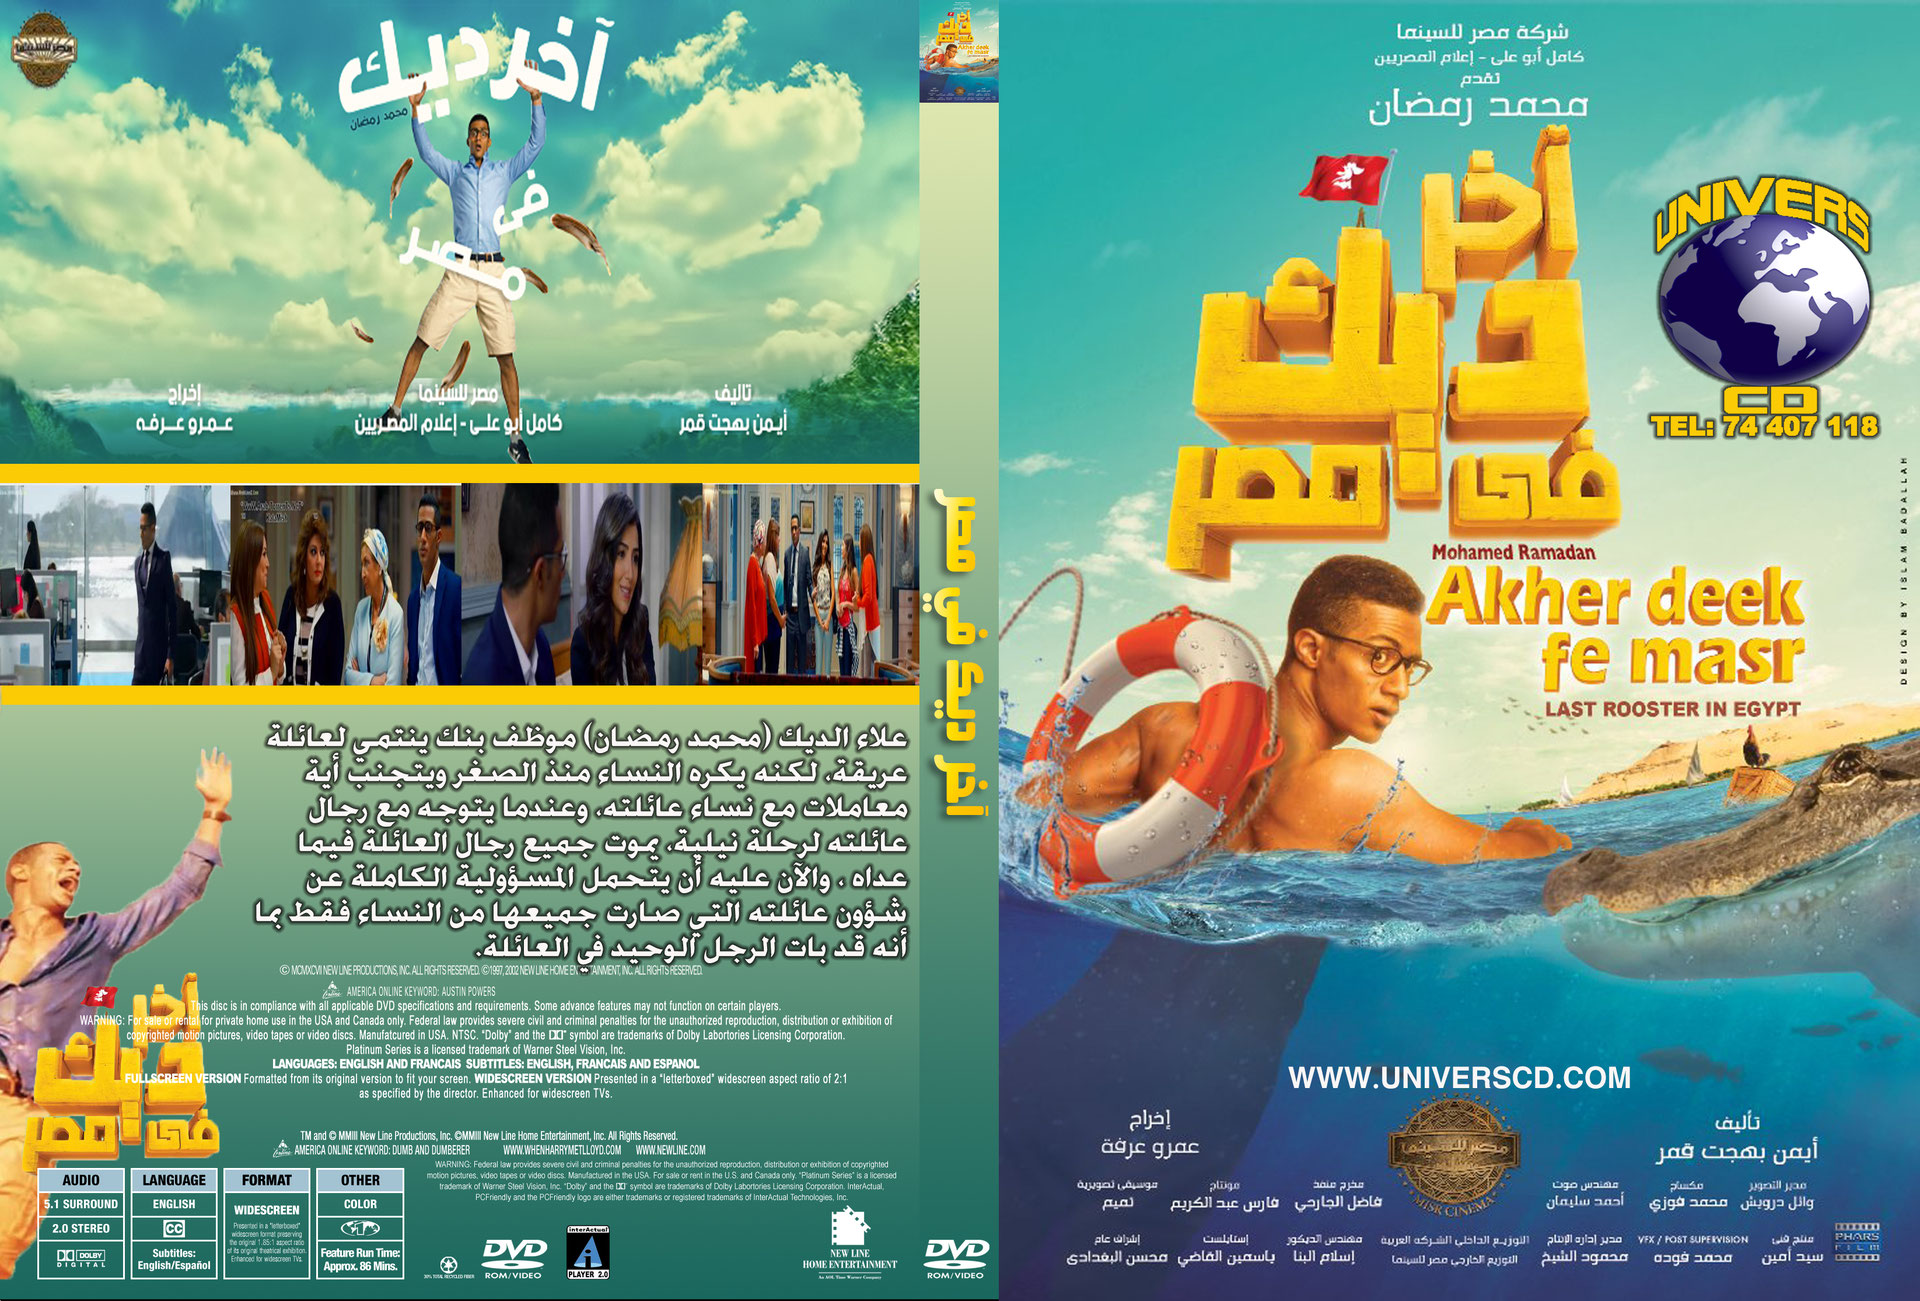 آخر ديك في مصر Universcd